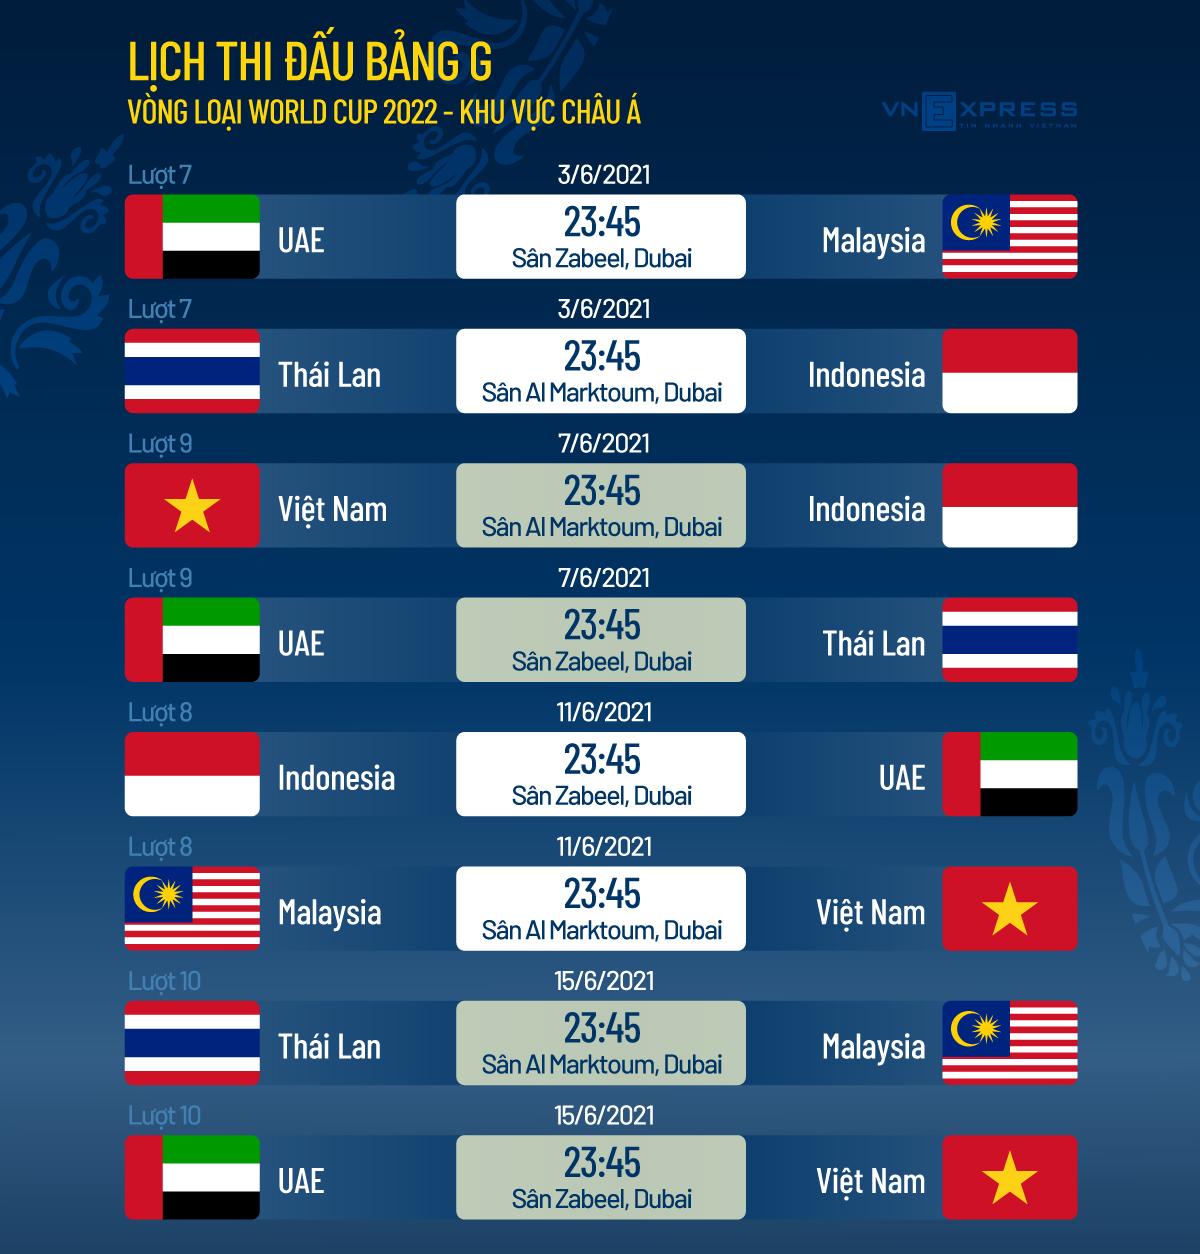 Gelandang Malaysia: UEA panik - 1